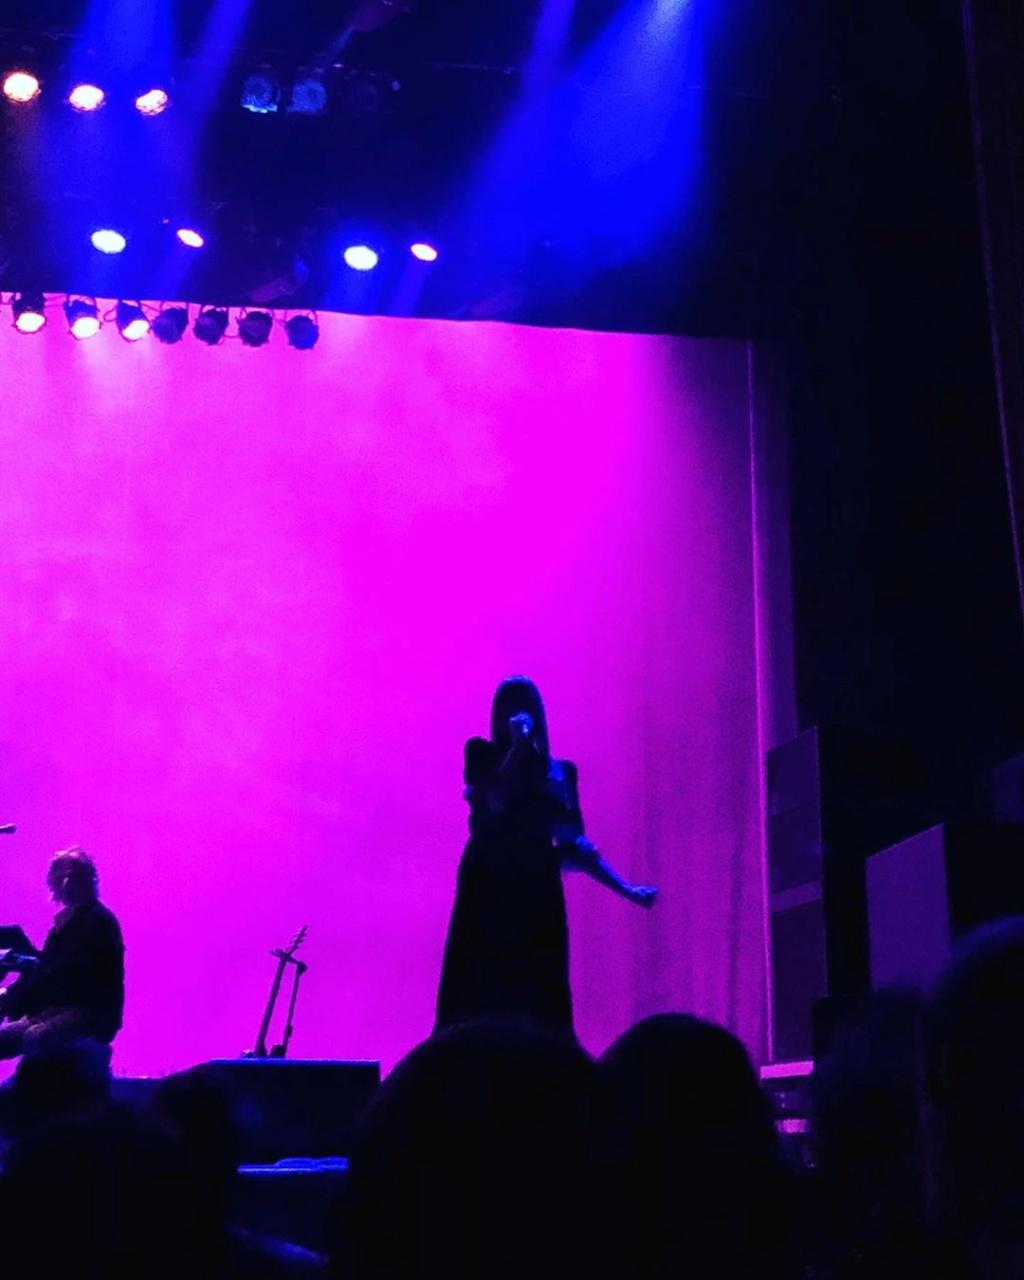 9/25/19 - Washington DC, Lincoln Theater 1374